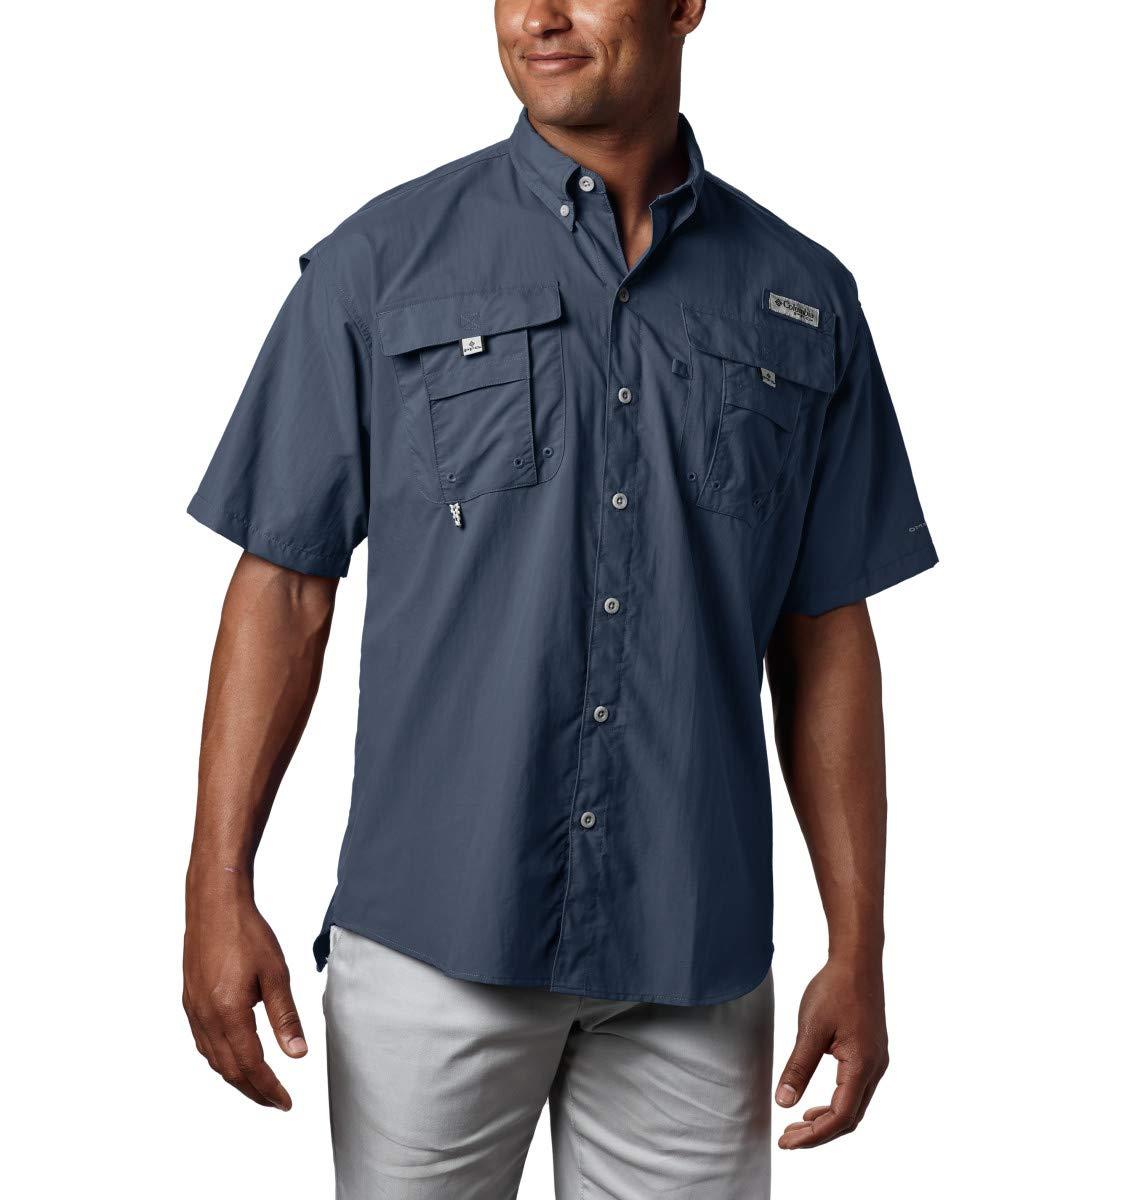 Columbia Men's PFG Bahama II Short Sleeve Shirt, Collegiate Navy, Large/Tall by Columbia